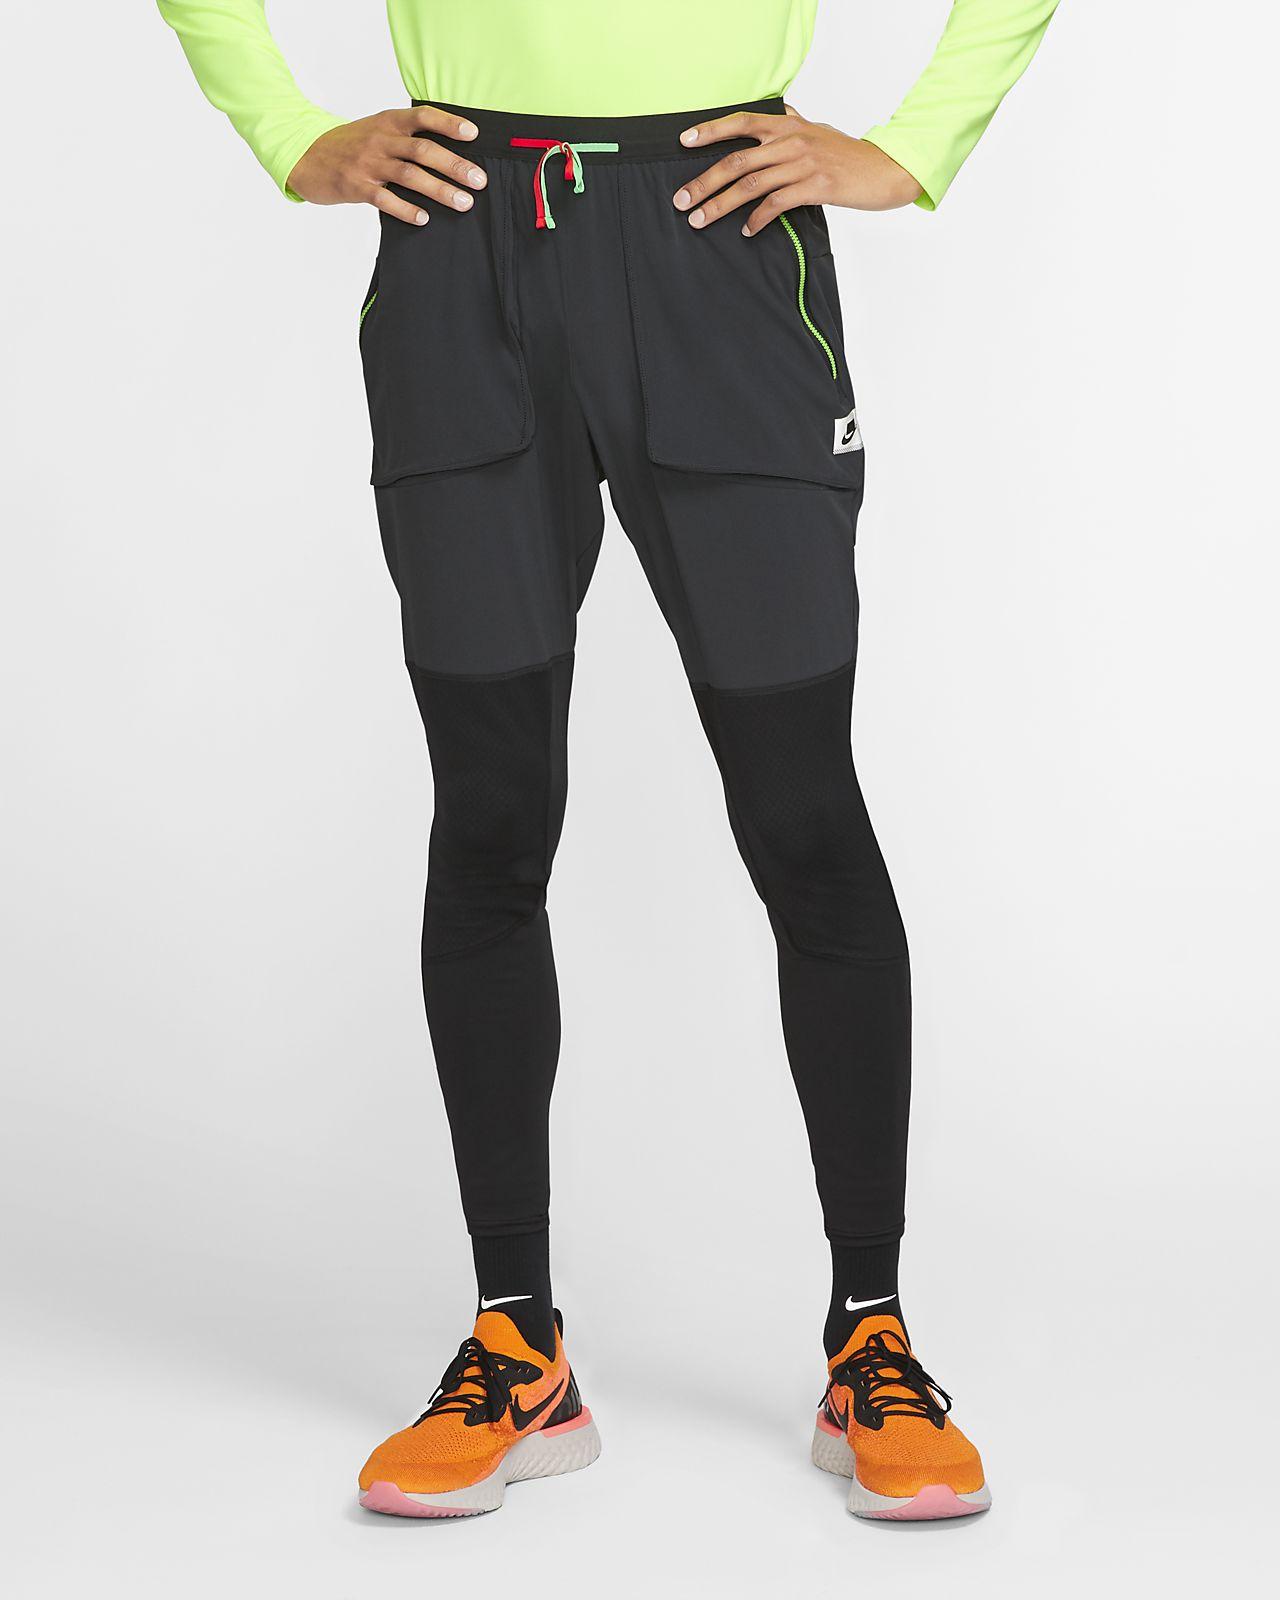 Nike Wild Run Men's Running Pants